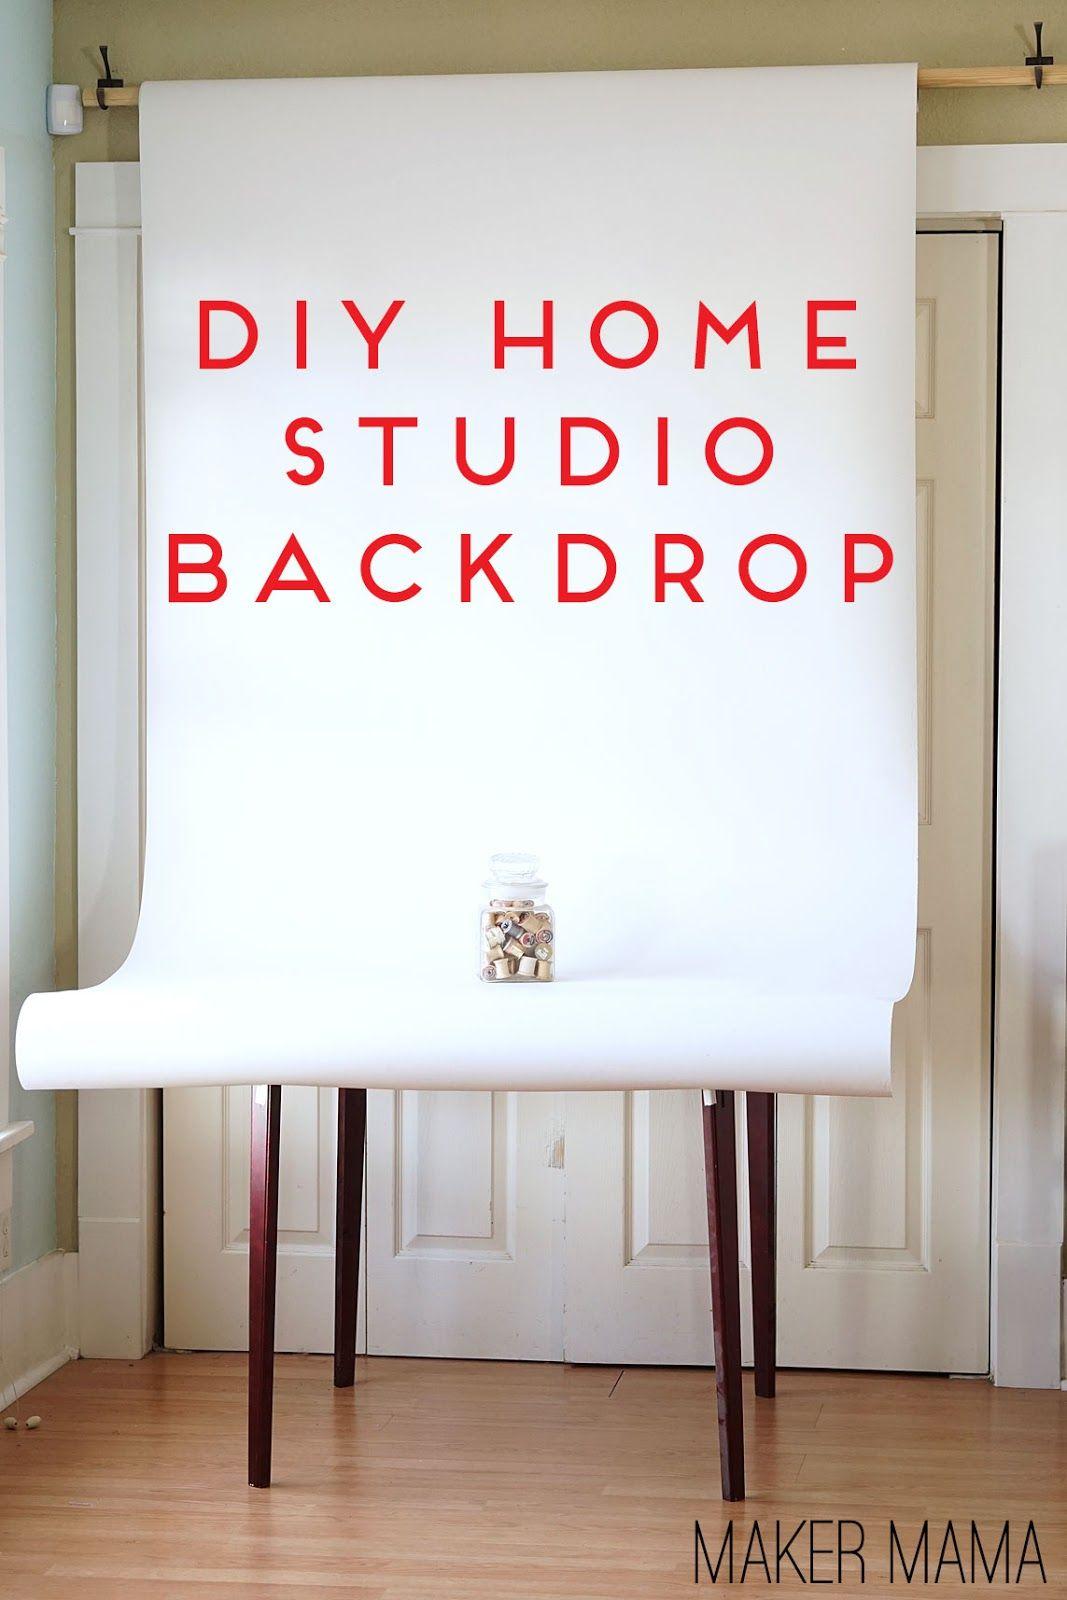 Diy Photo Backdrop Maker Mama Home Photo Studio Diy Photo Backdrop Studio Backdrops